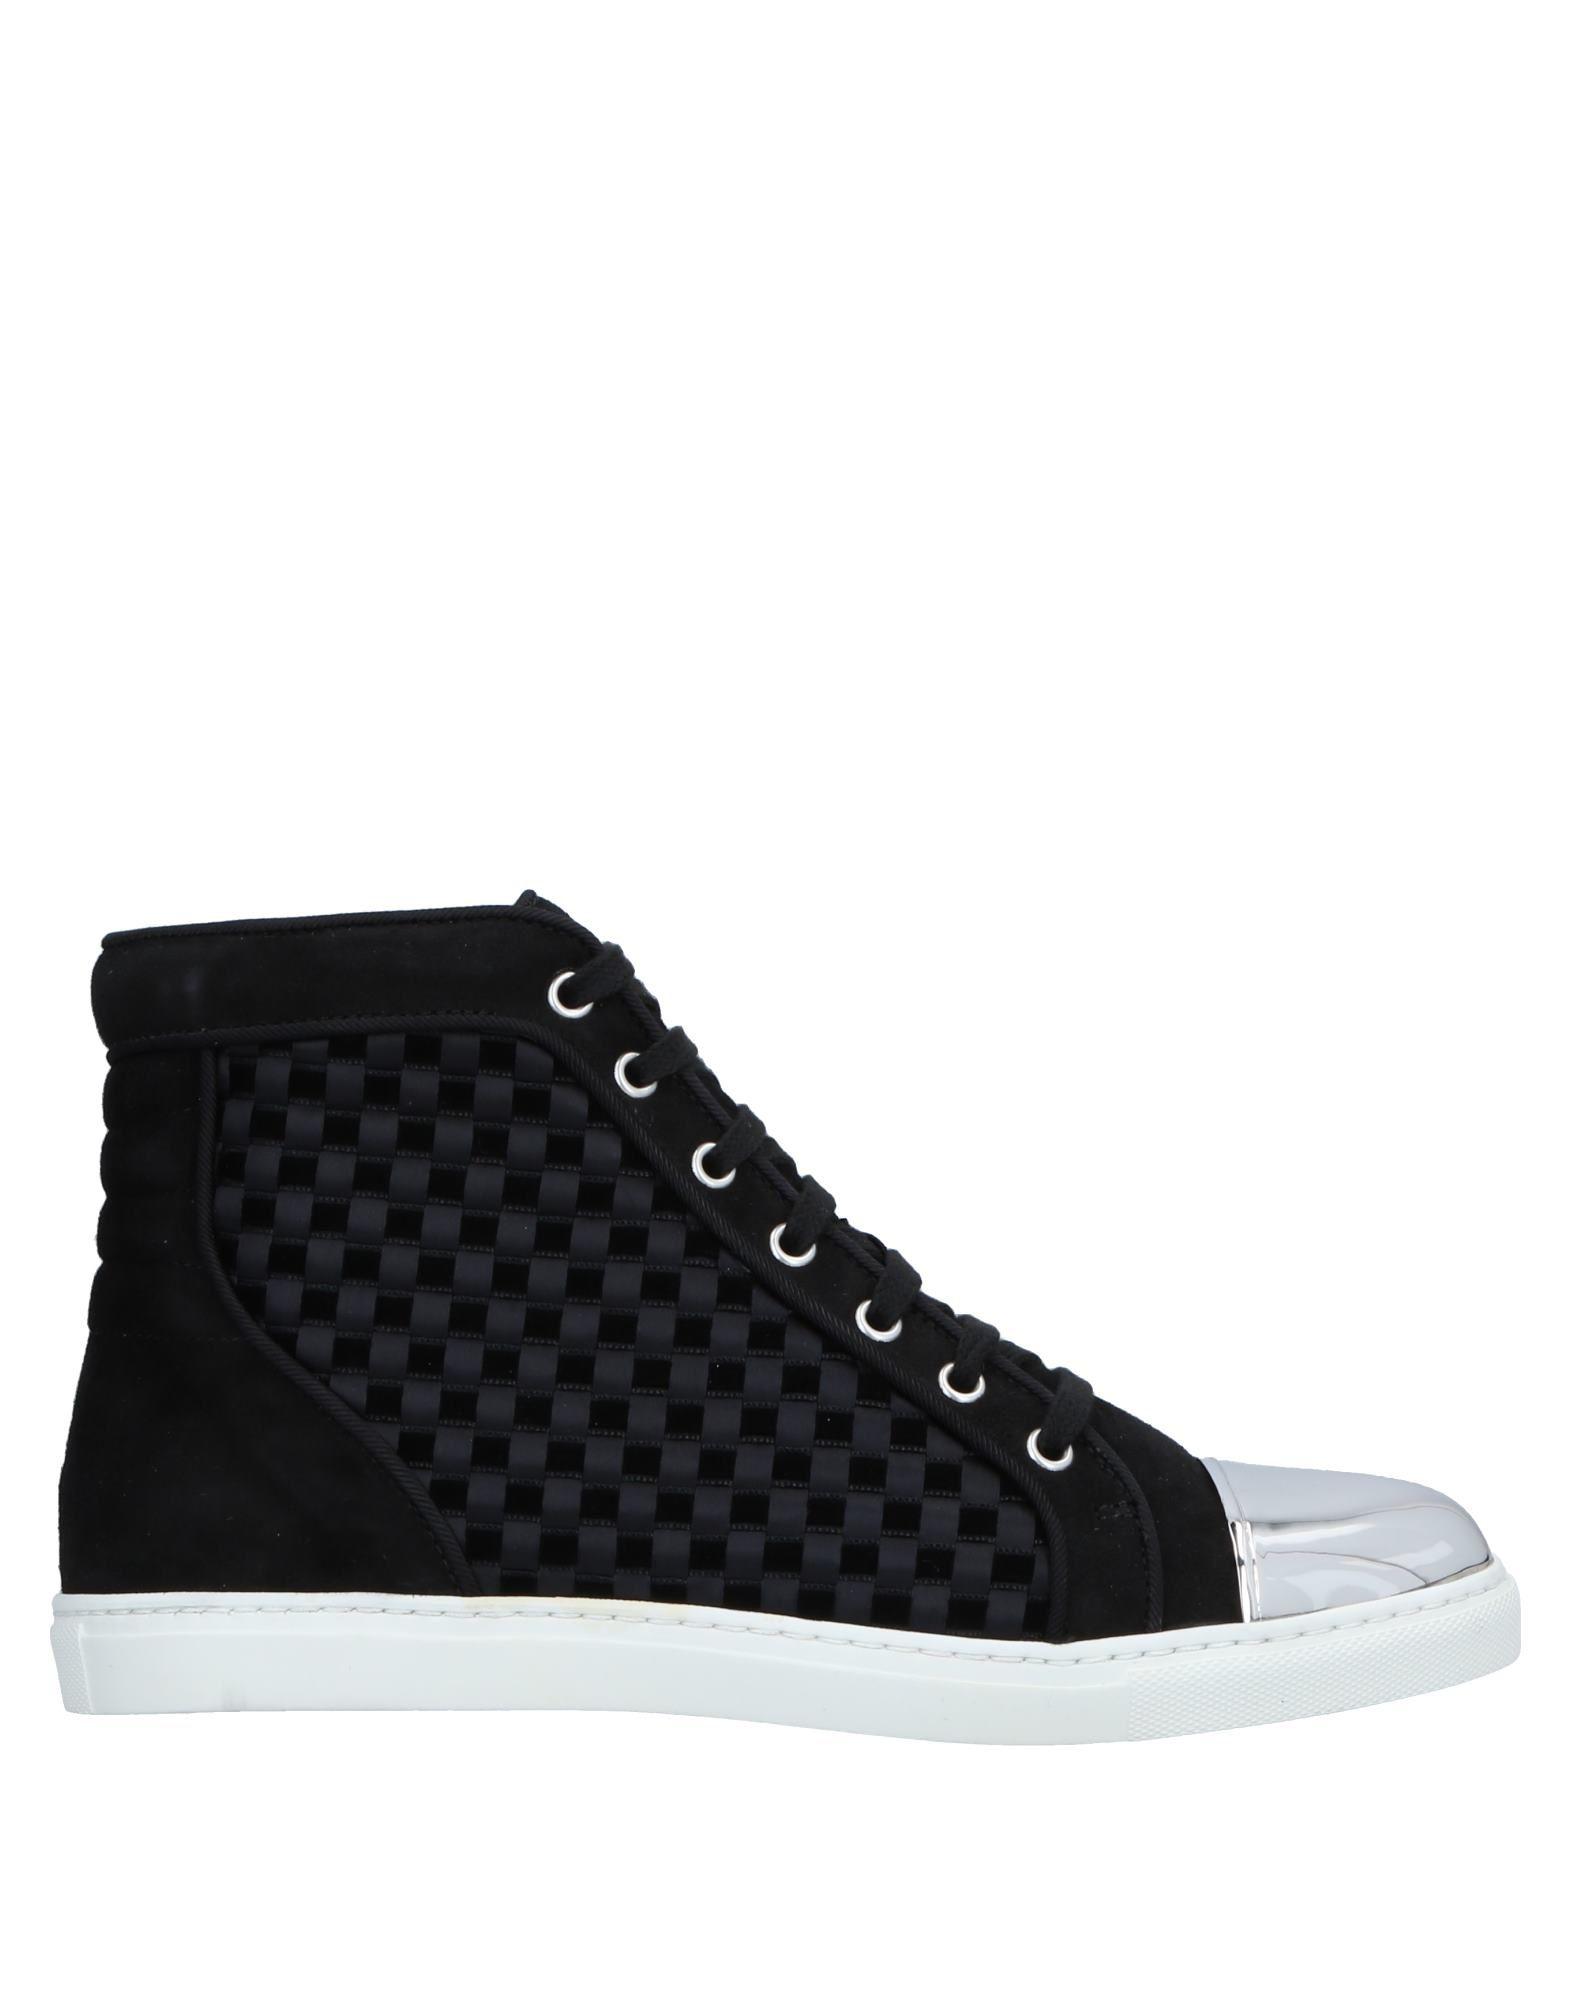 Louis Leeman Sneakers - Men Louis Leeman Sneakers Kingdom online on  United Kingdom Sneakers - 11542773VE 583cb5